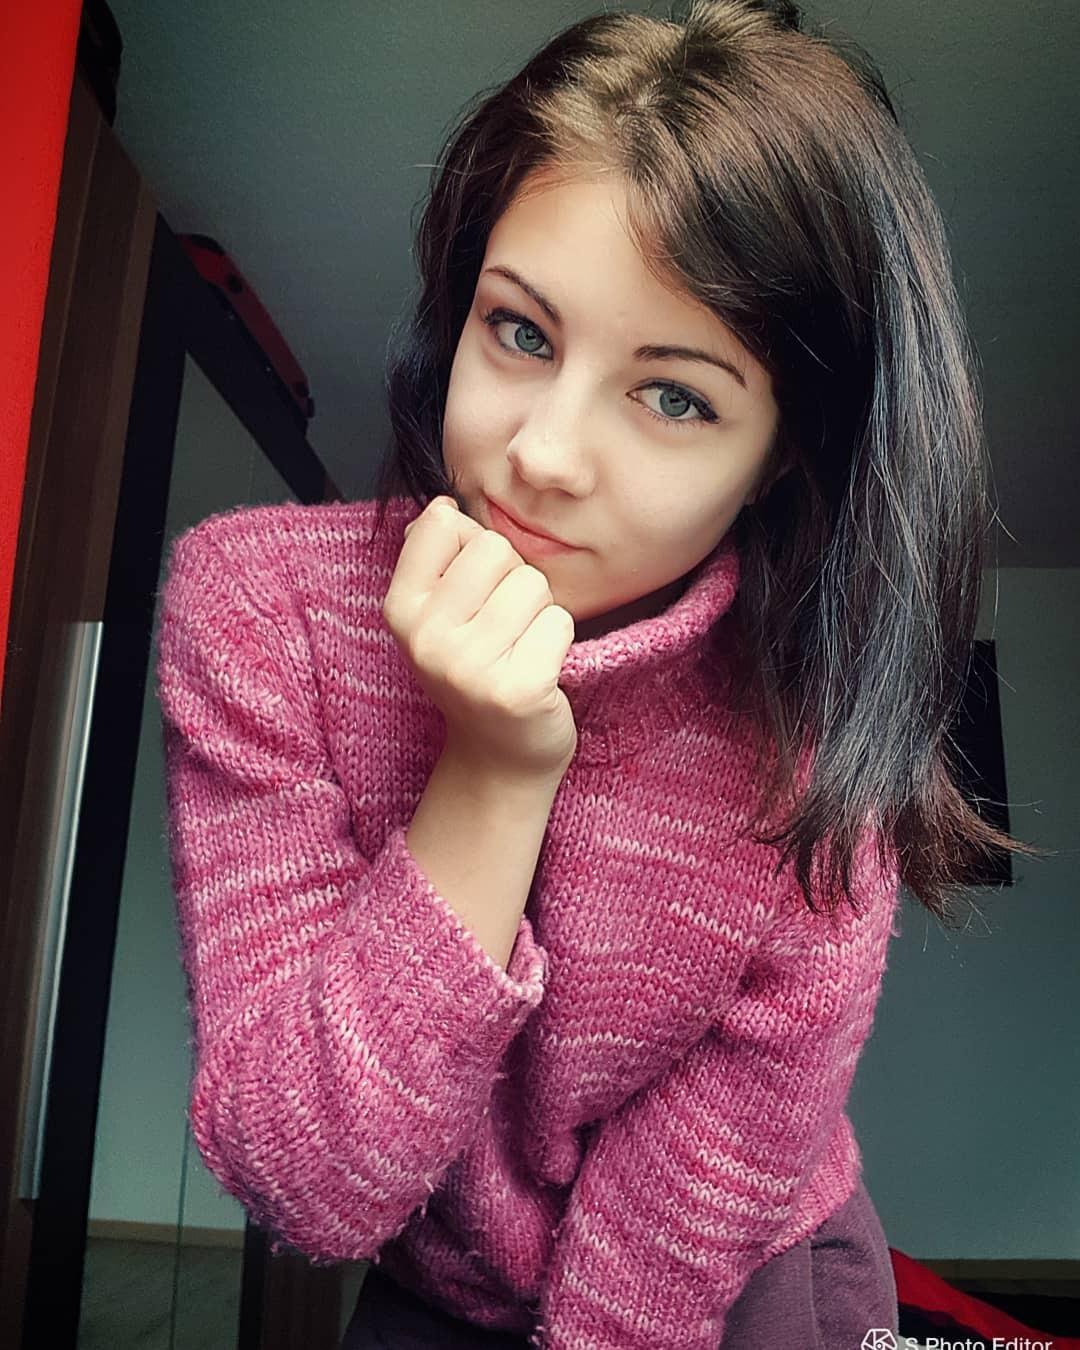 Fille Brune Au Yeux Bleu : fille, brune, Brune, Bleus